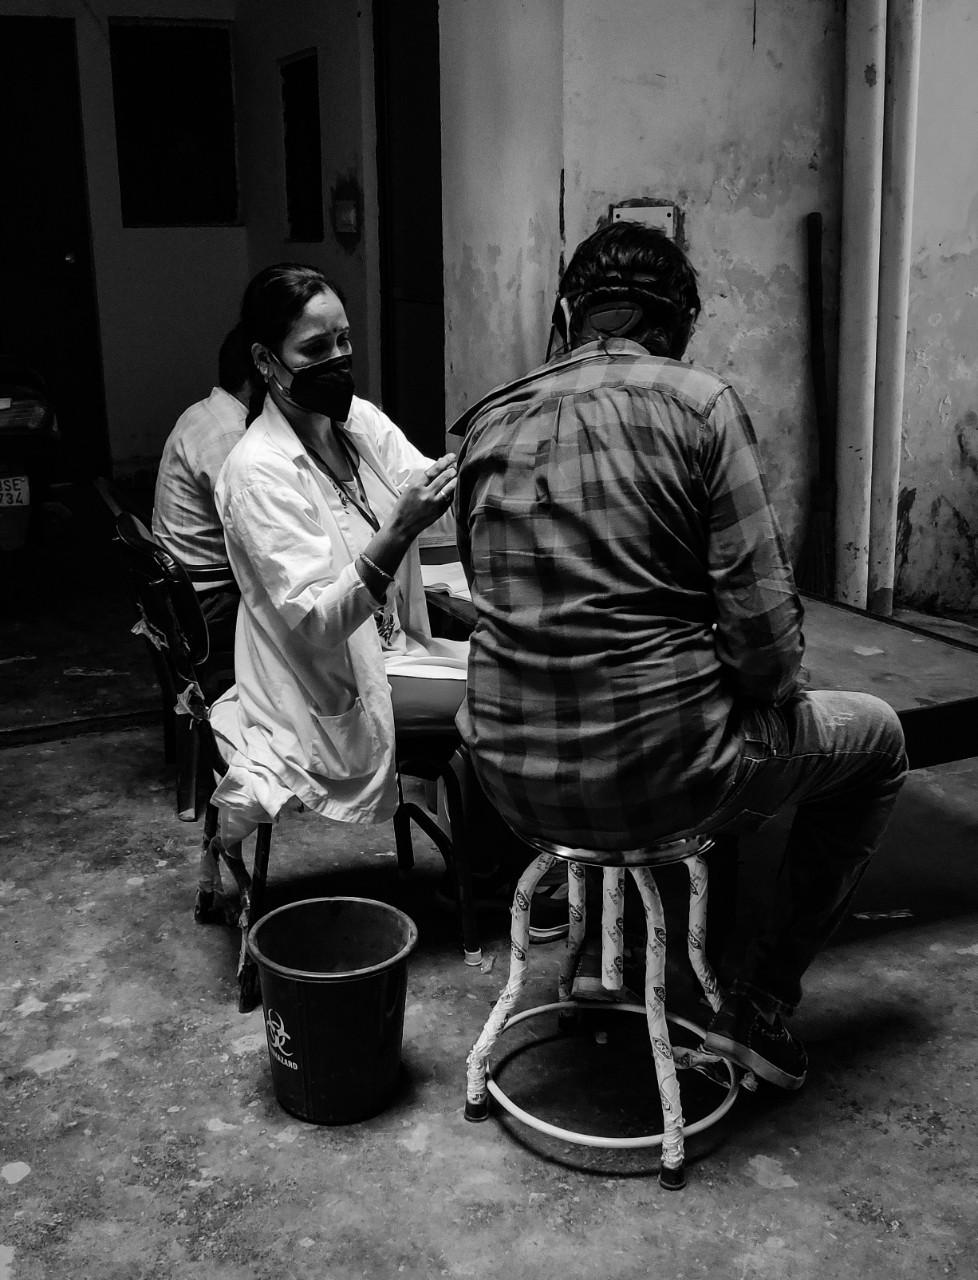 Photo by Swarnavo Chakrabarti on Unsplash